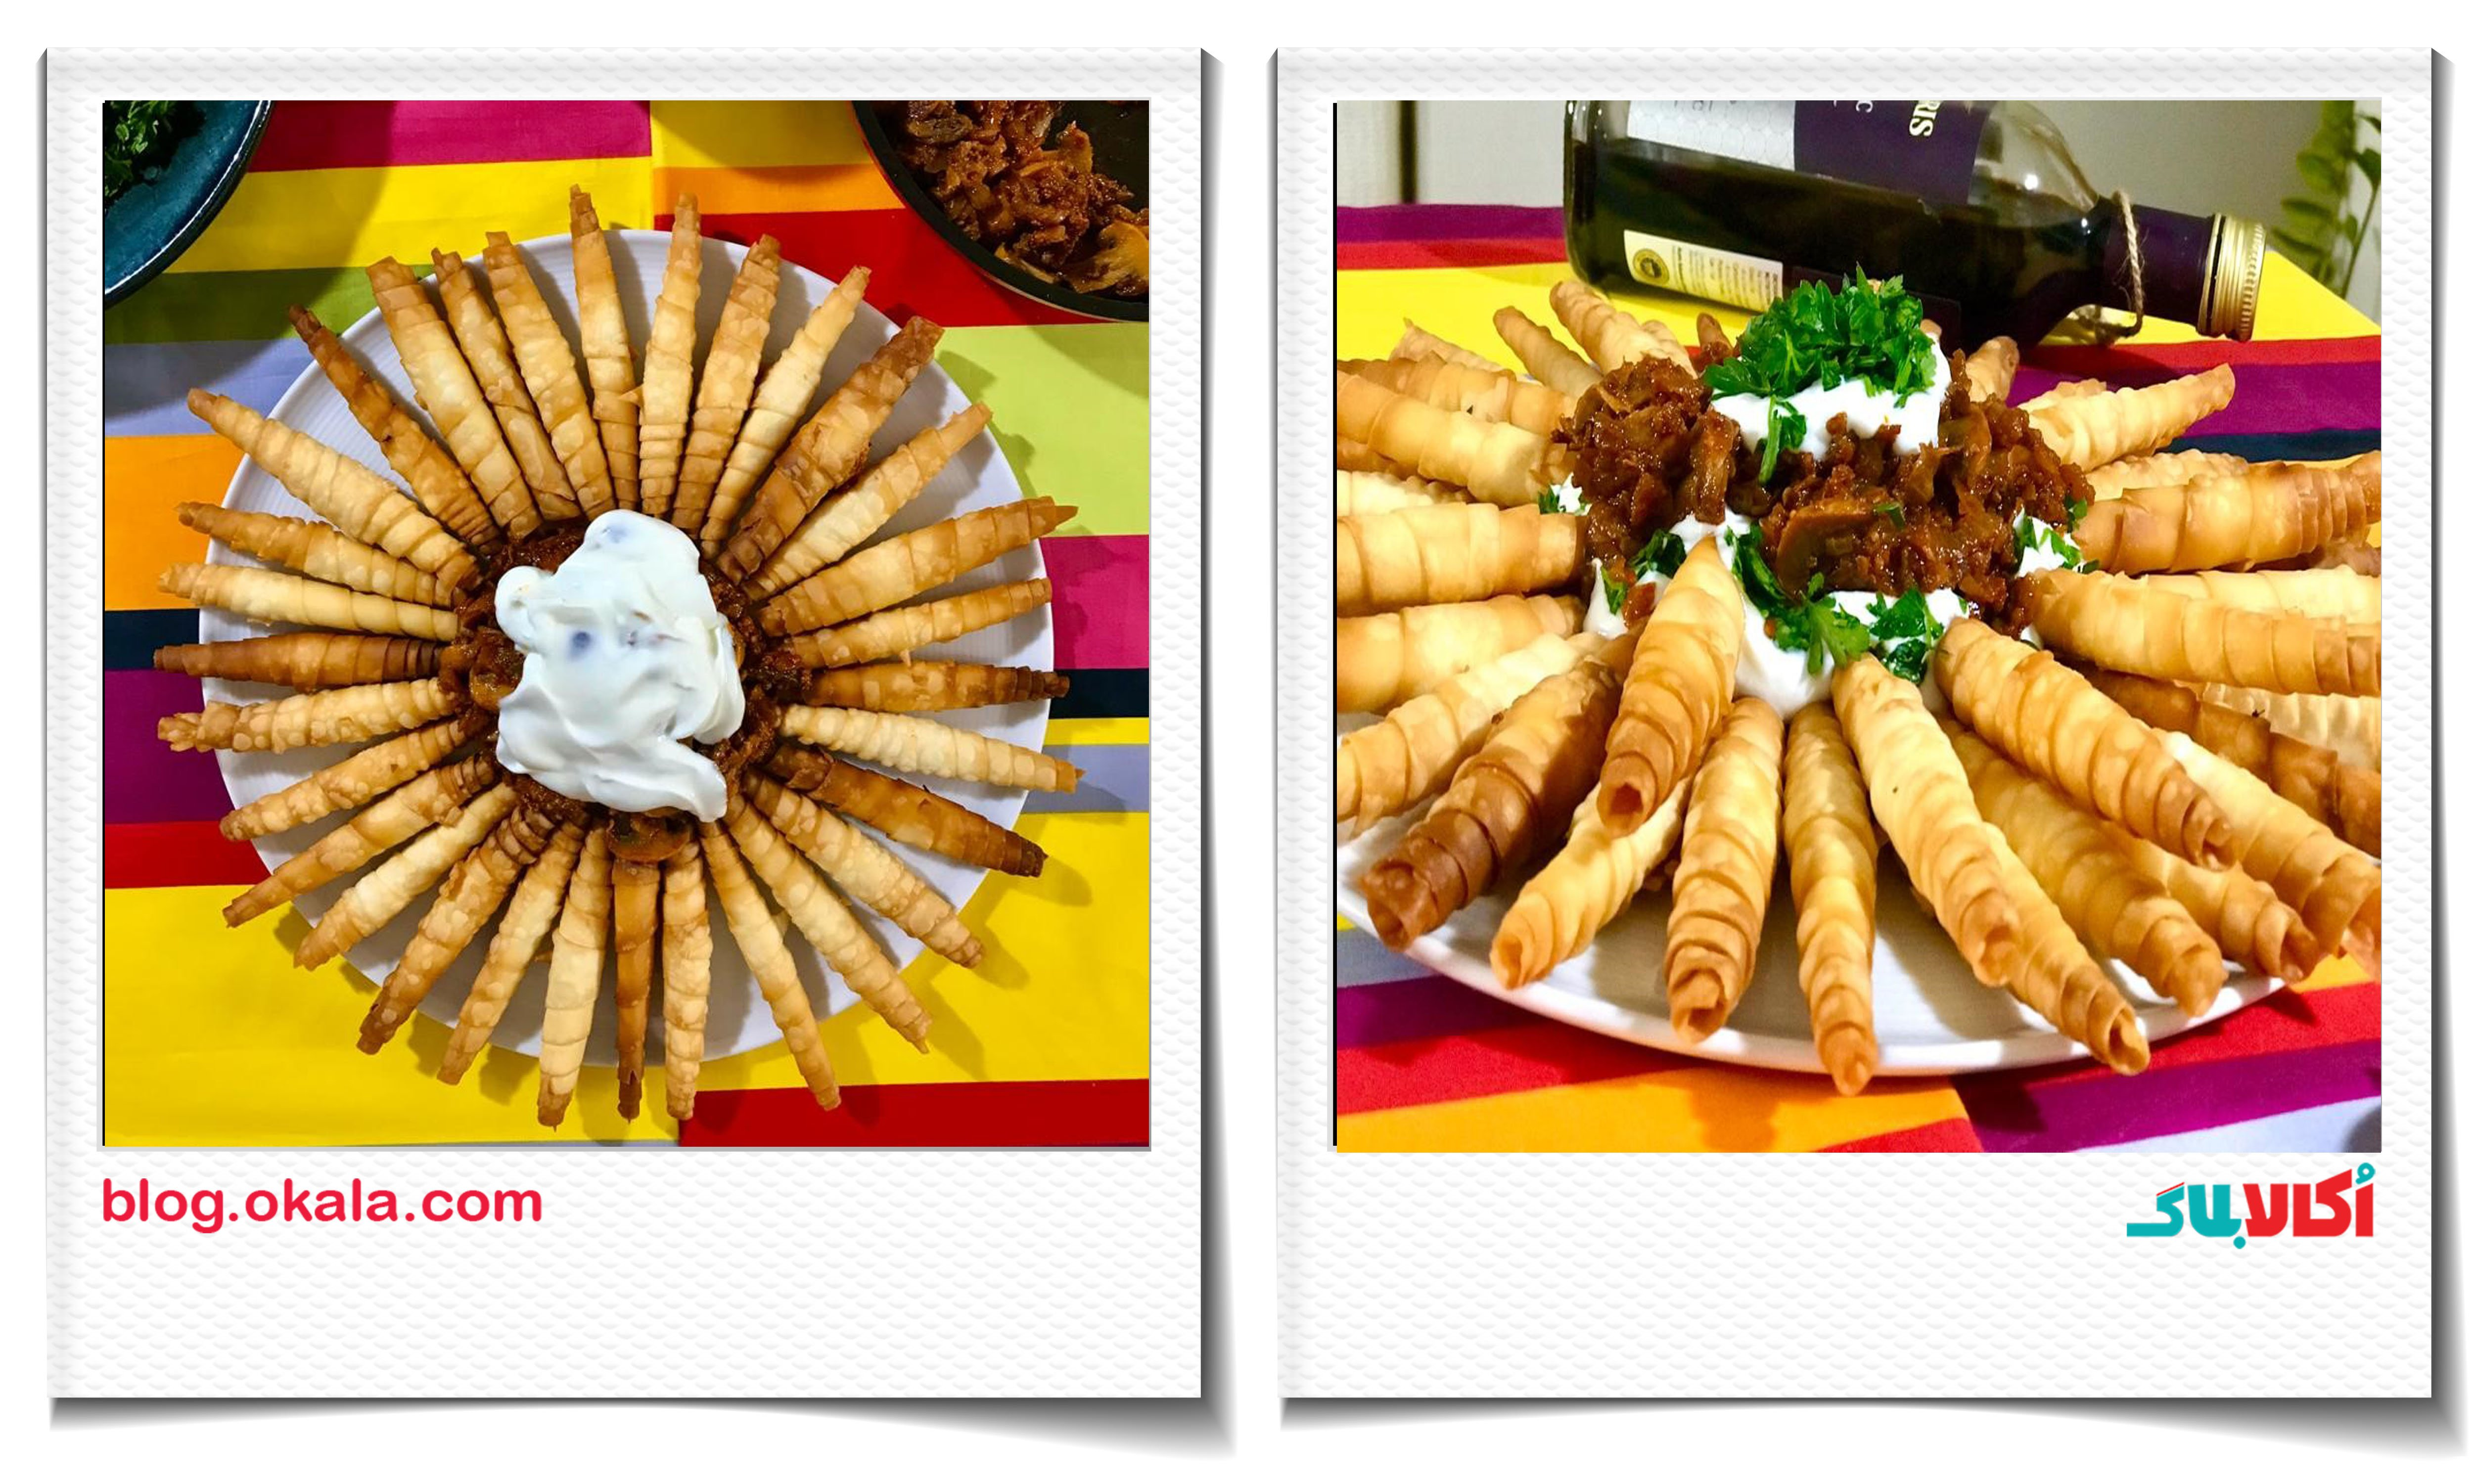 tarze tahie kozalakmanti طرز تهیه غذای ترکیه ای مانتی کوزالاک مرحله به مرحله